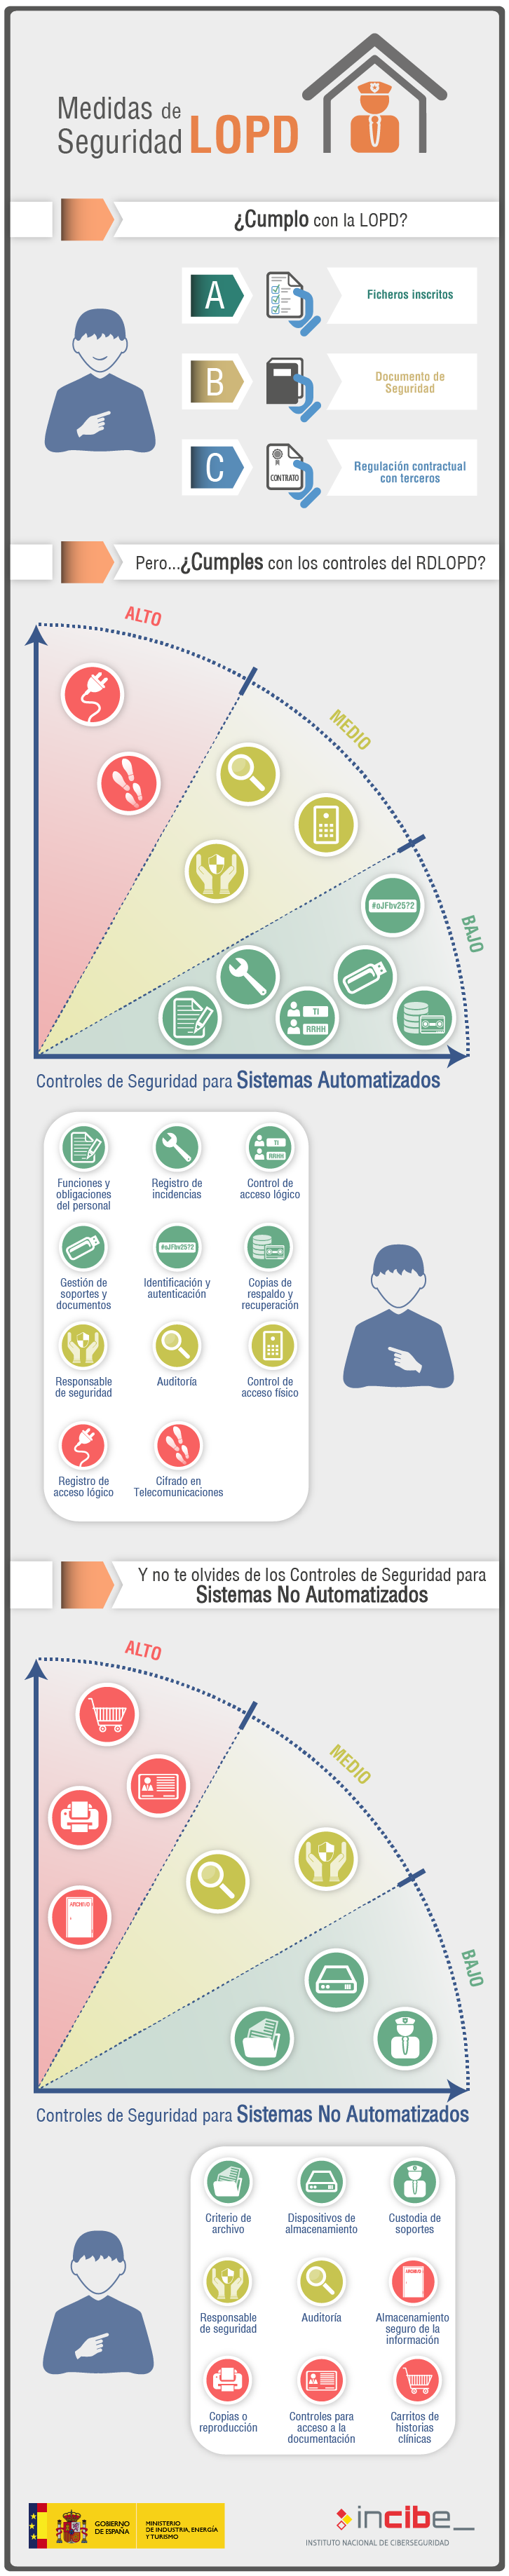 infografia_medidas_seguridad_en_lopd